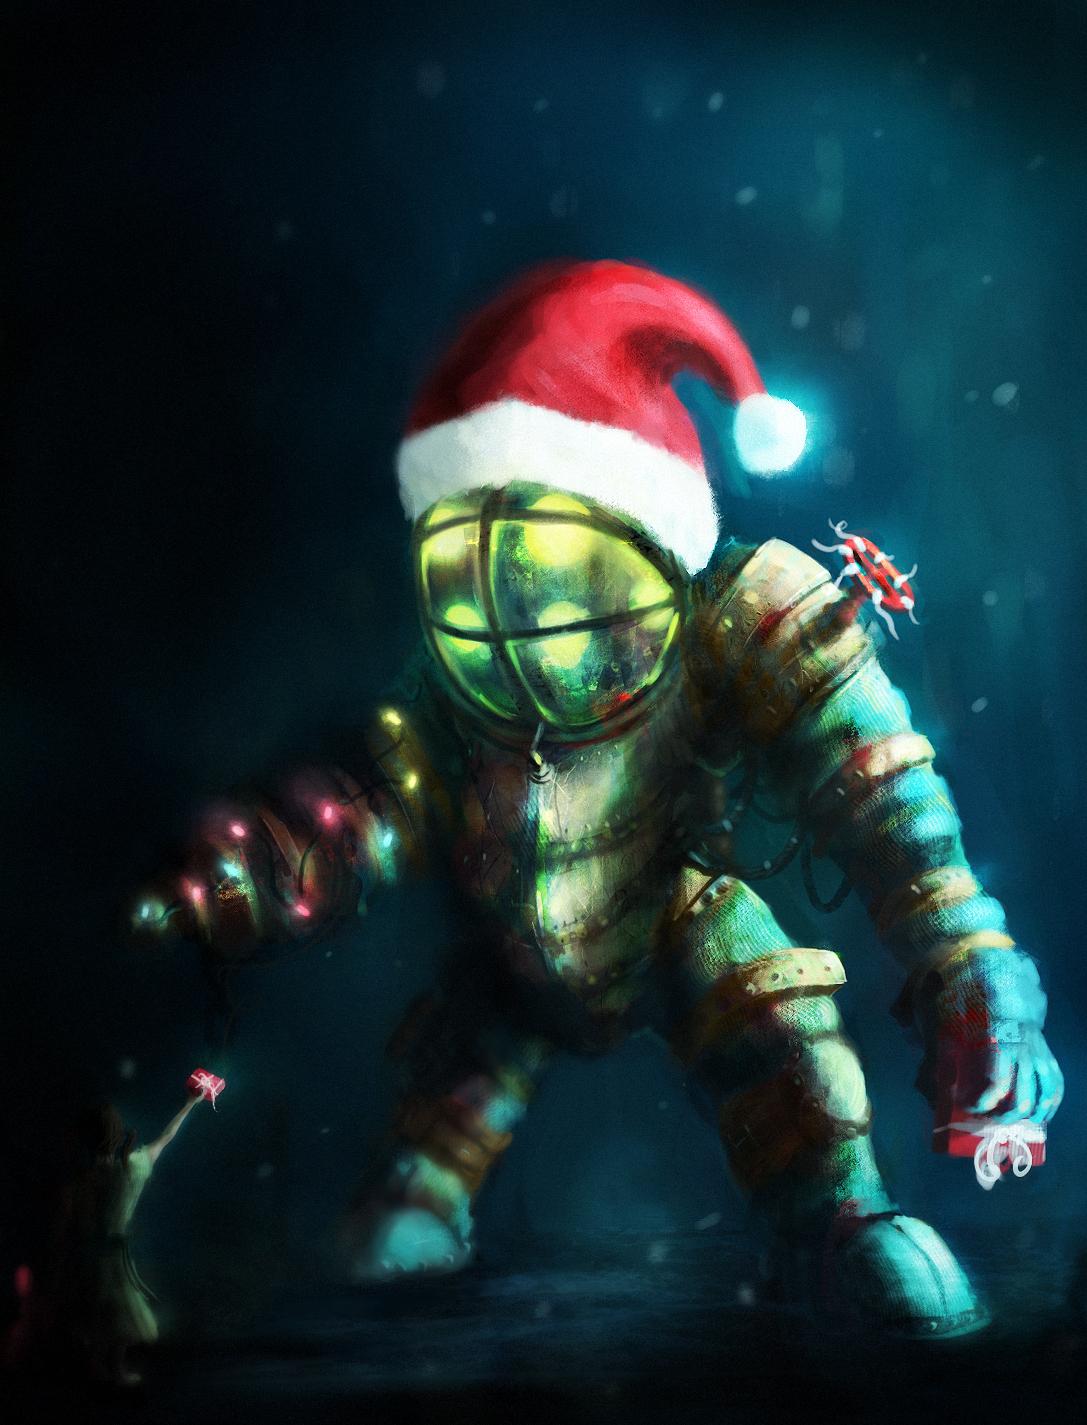 Merry Christmas Mr.Bubbles